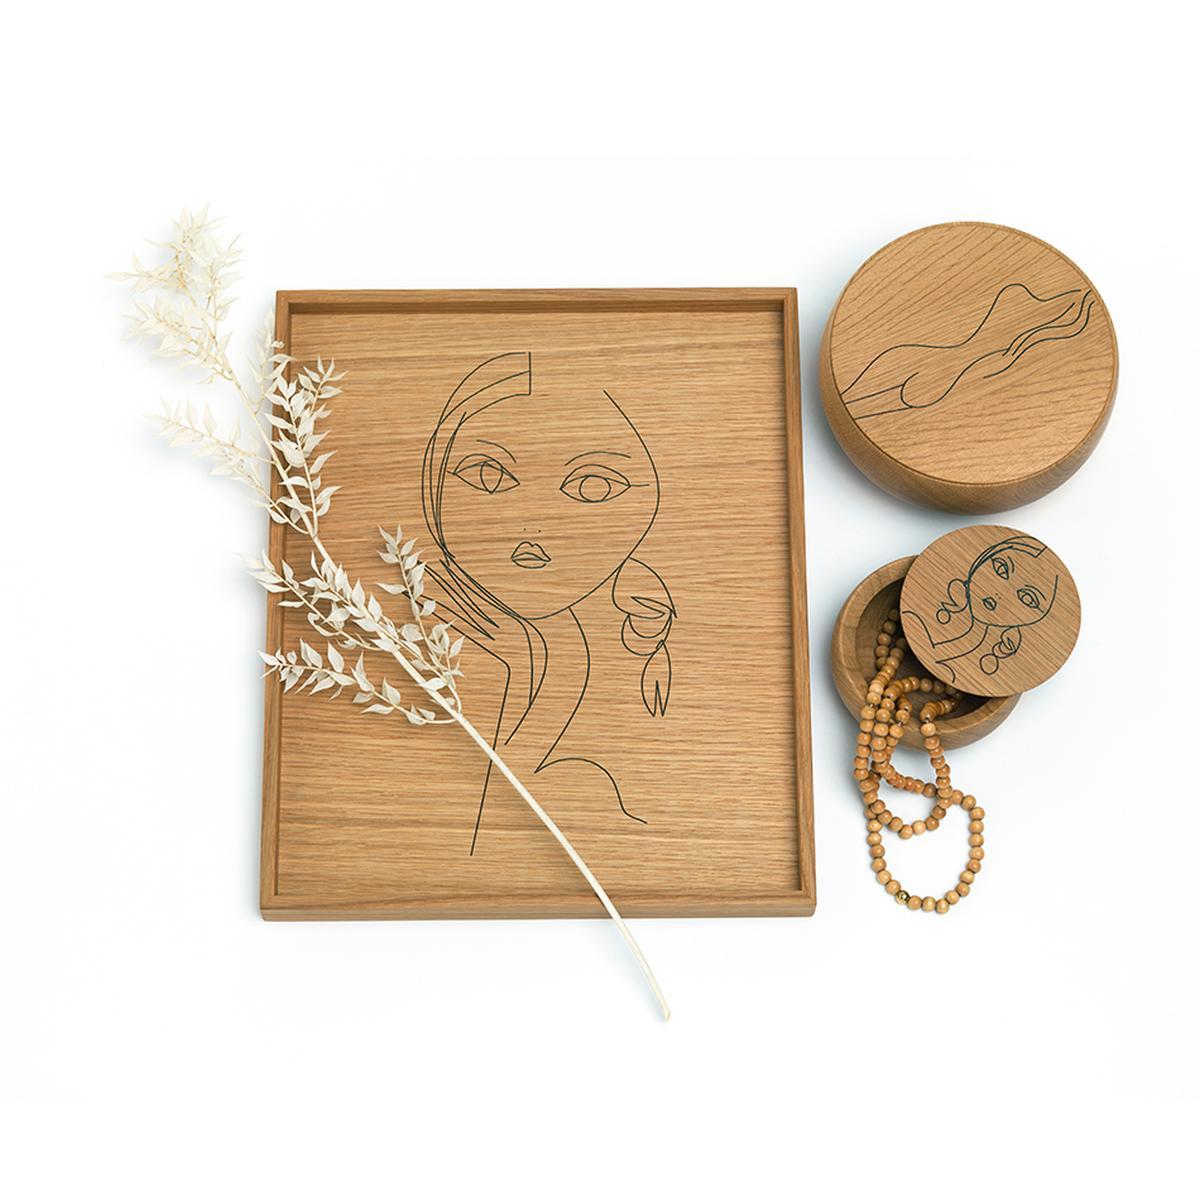 TRAY Tablett und BOWL Holzdosen Edition IRMA